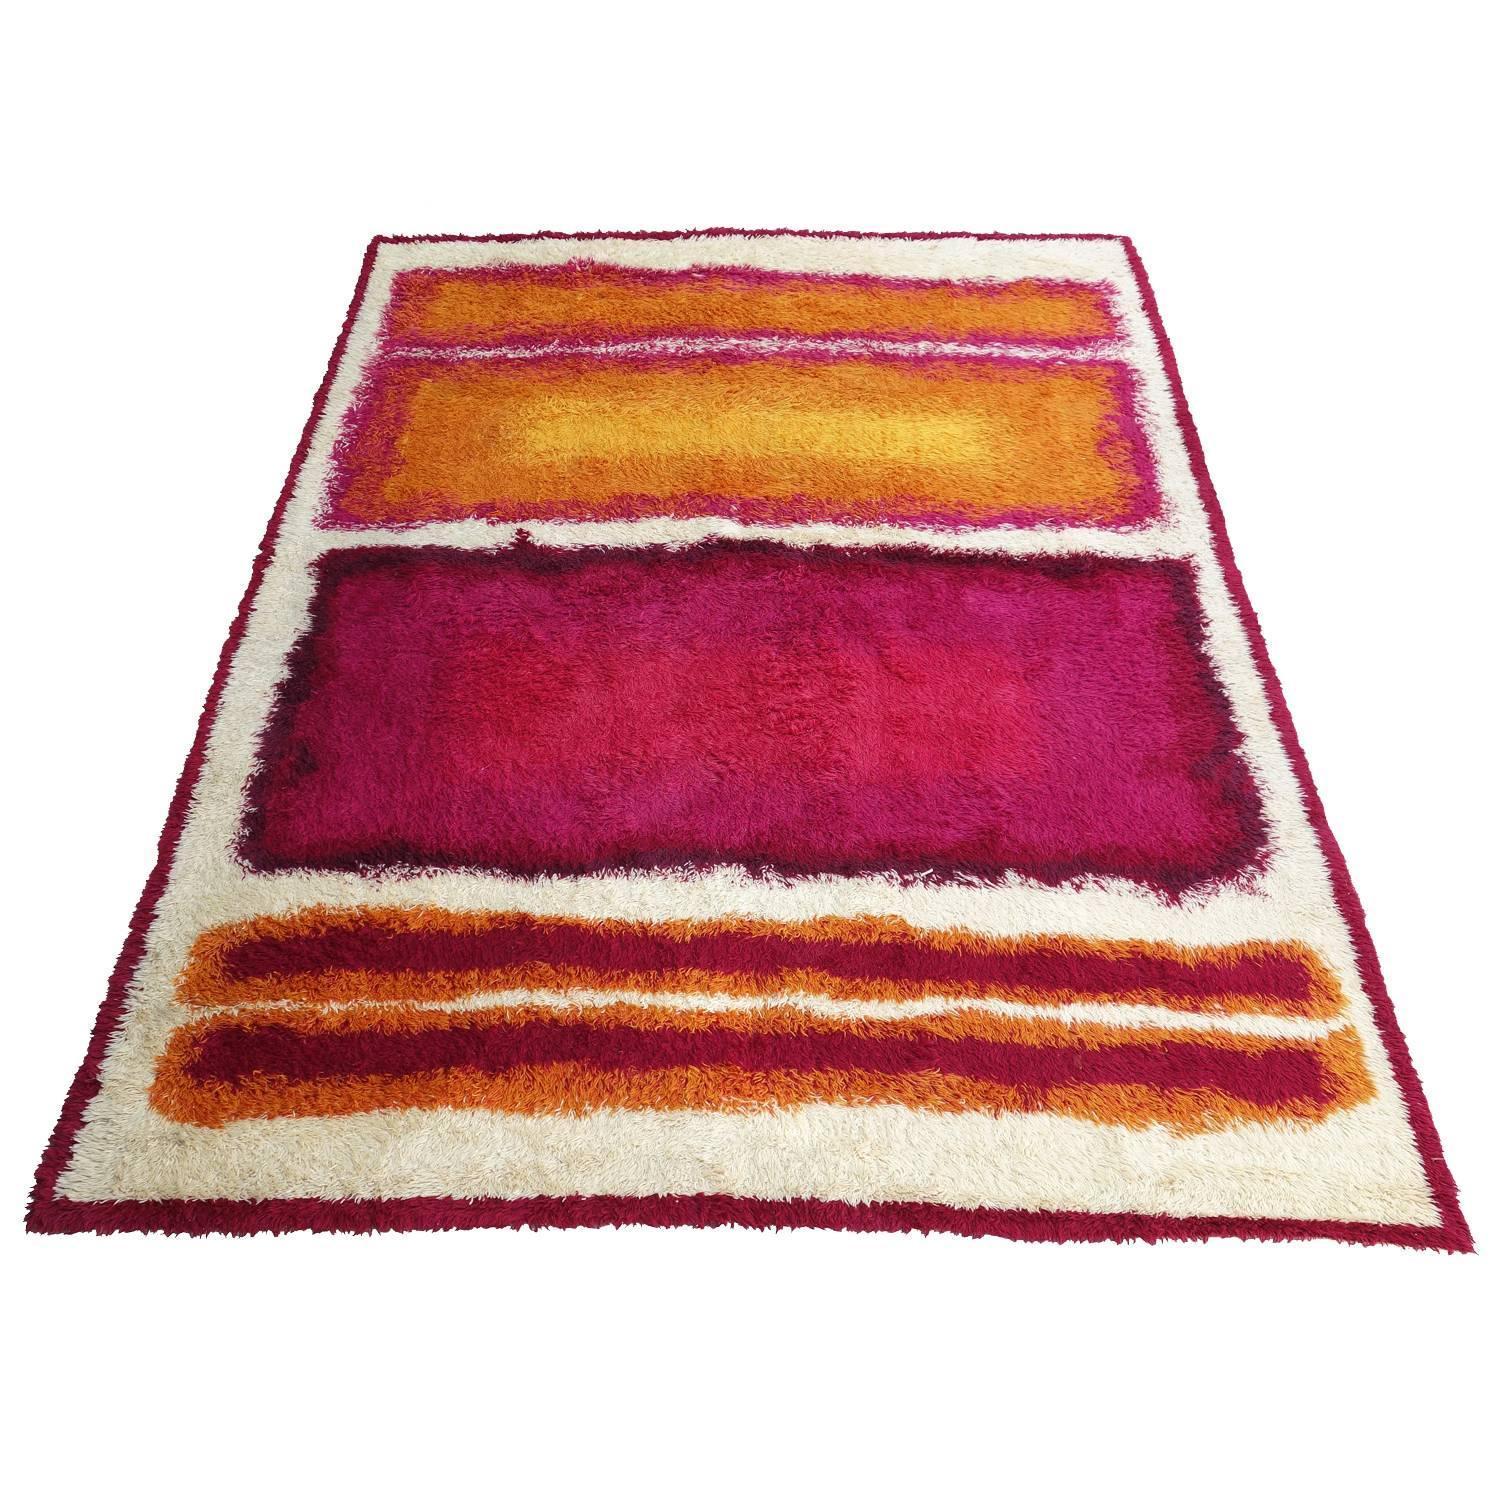 Mid-Century Mark Rothko Inspired Shag Rya Rug At 1stdibs